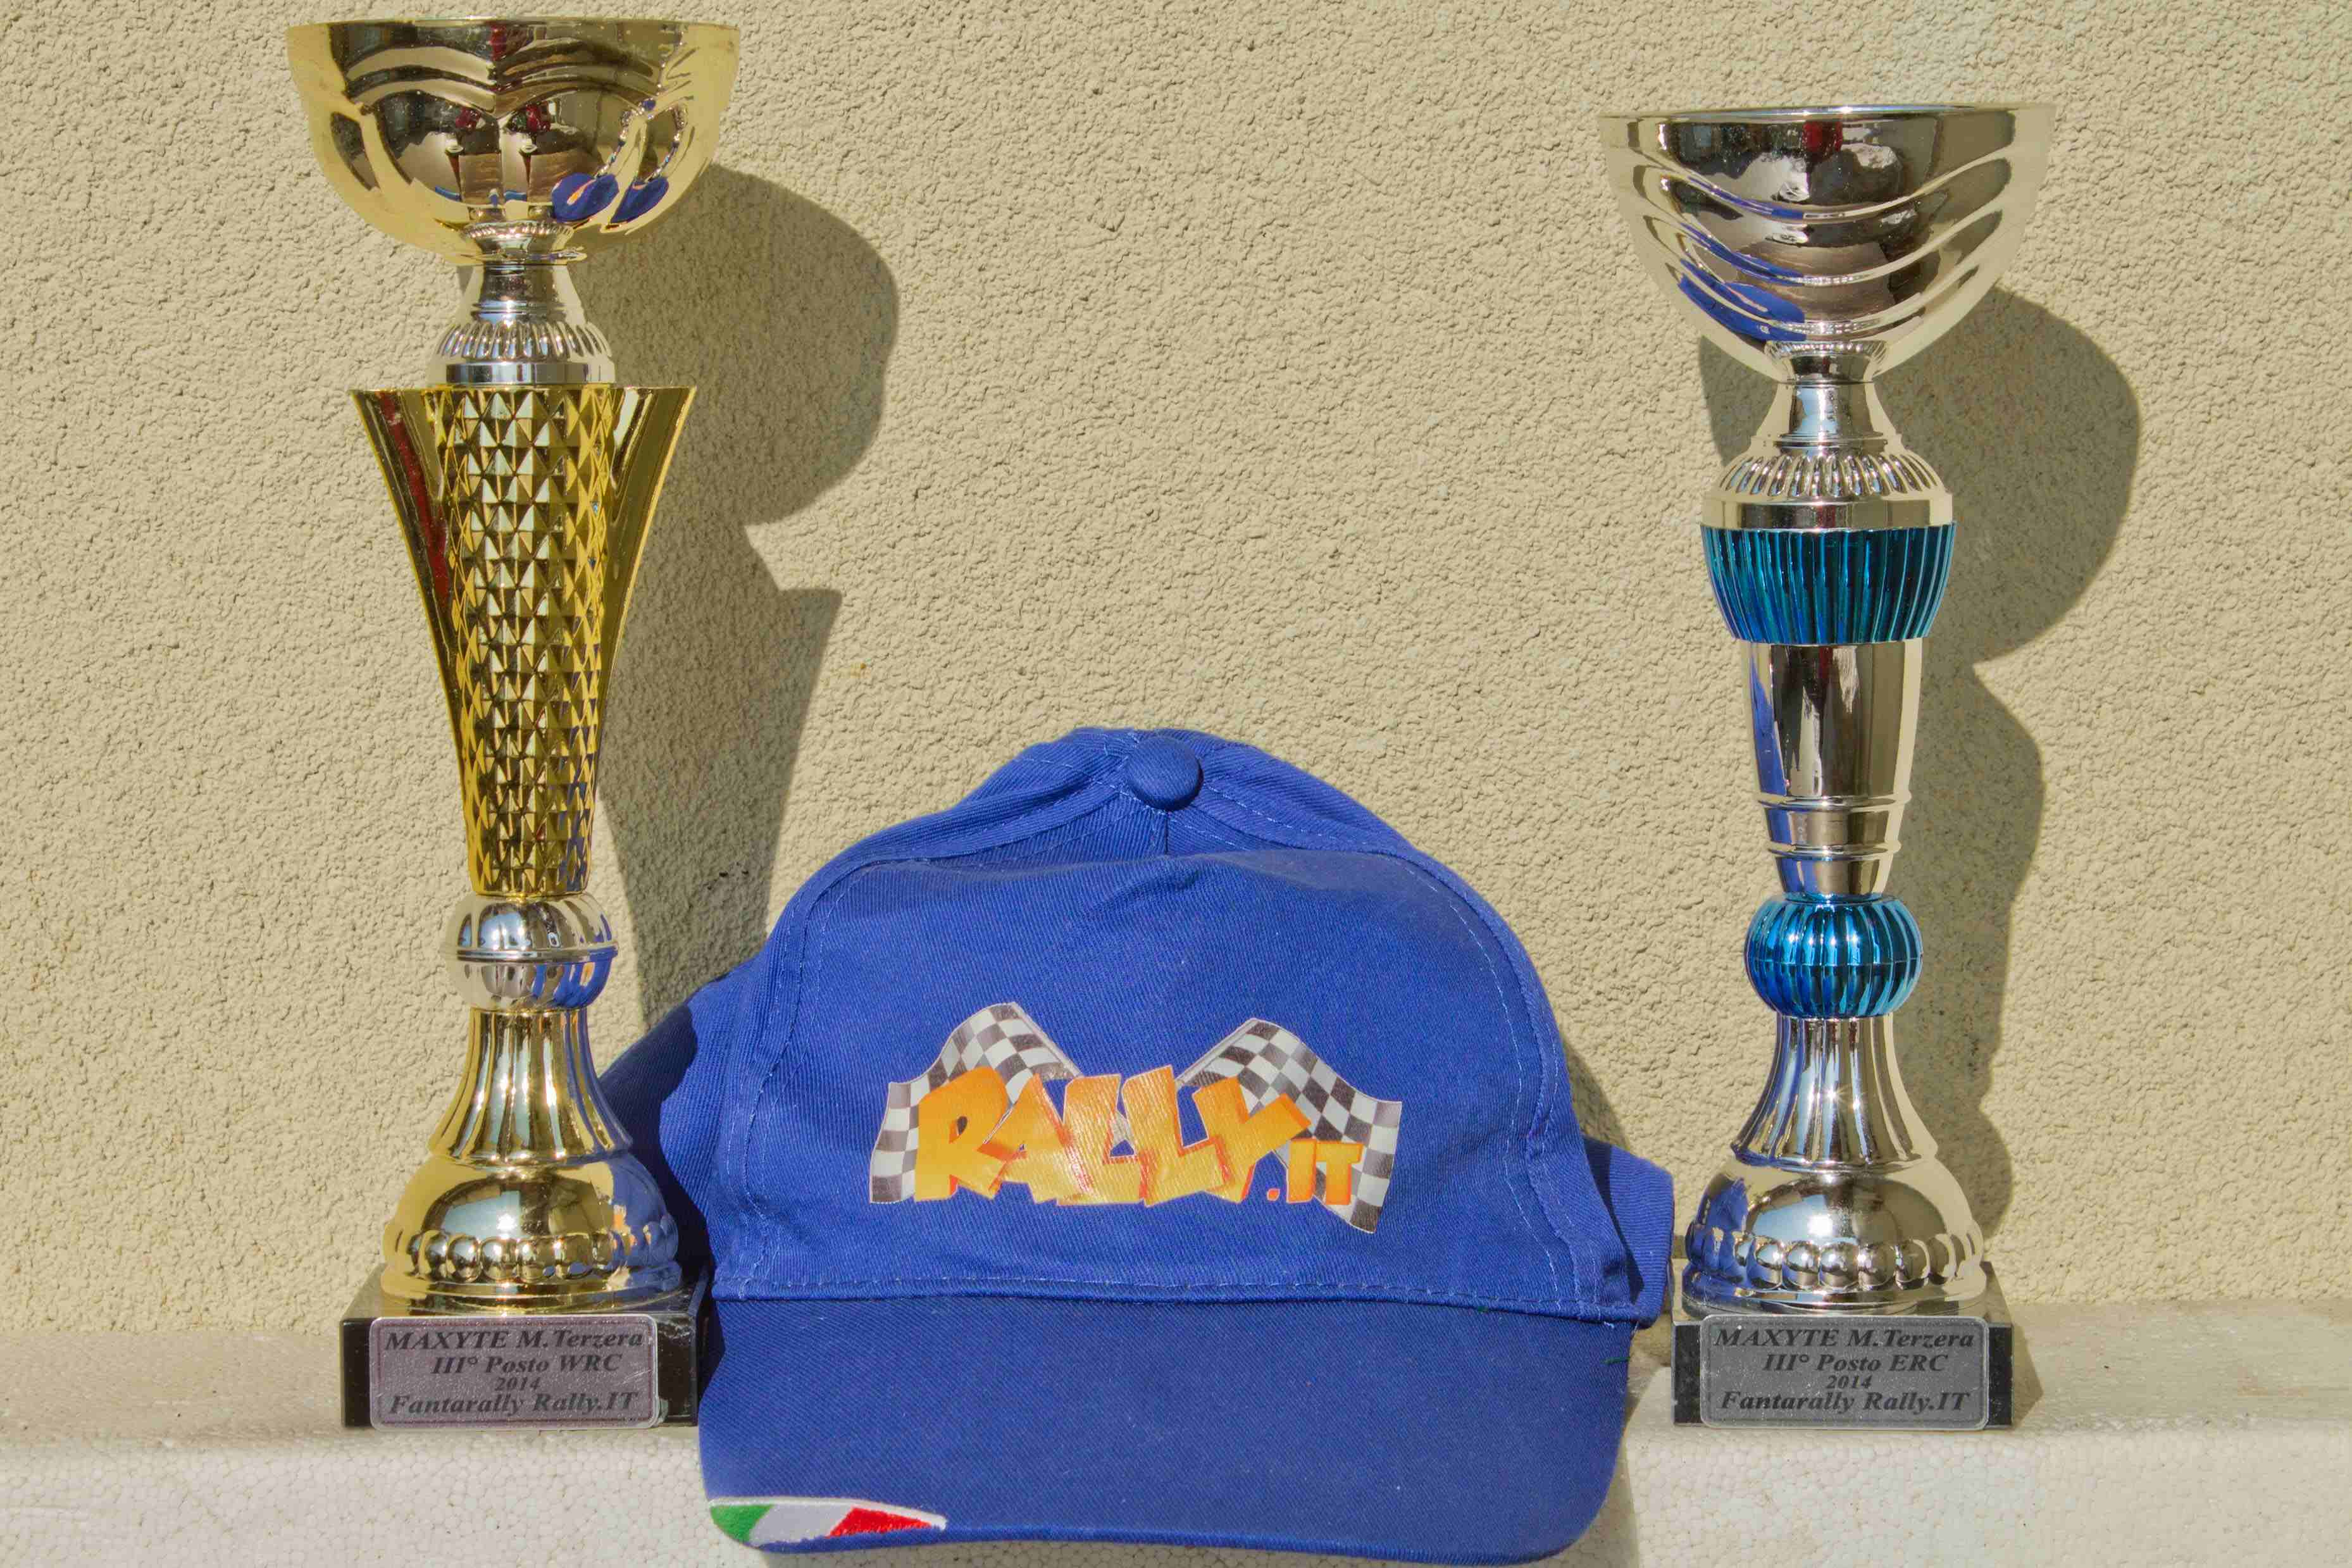 Trofei fantarally -.jpg